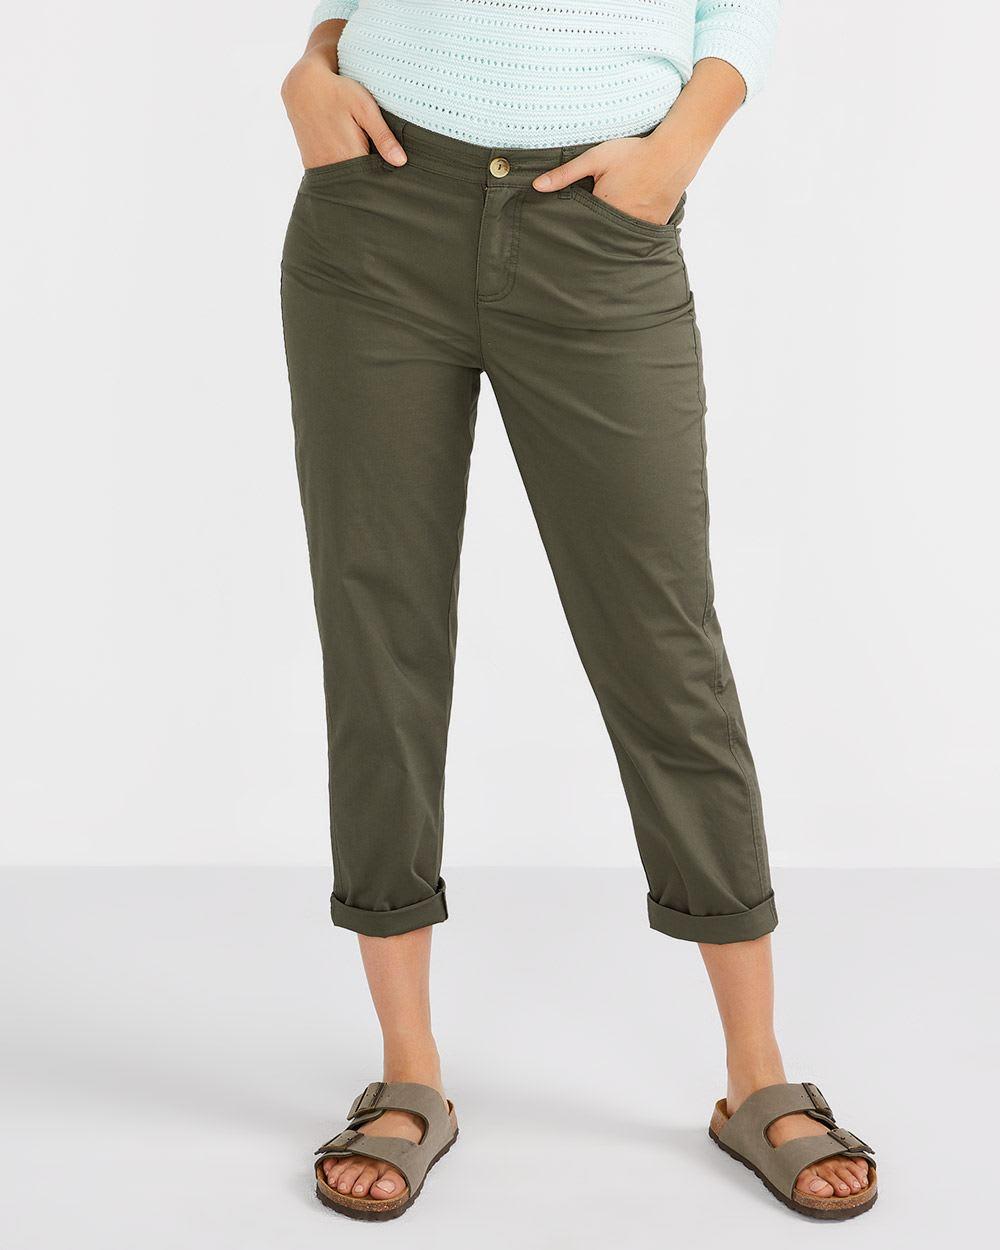 Cotton Blend Cropped Chino Pants